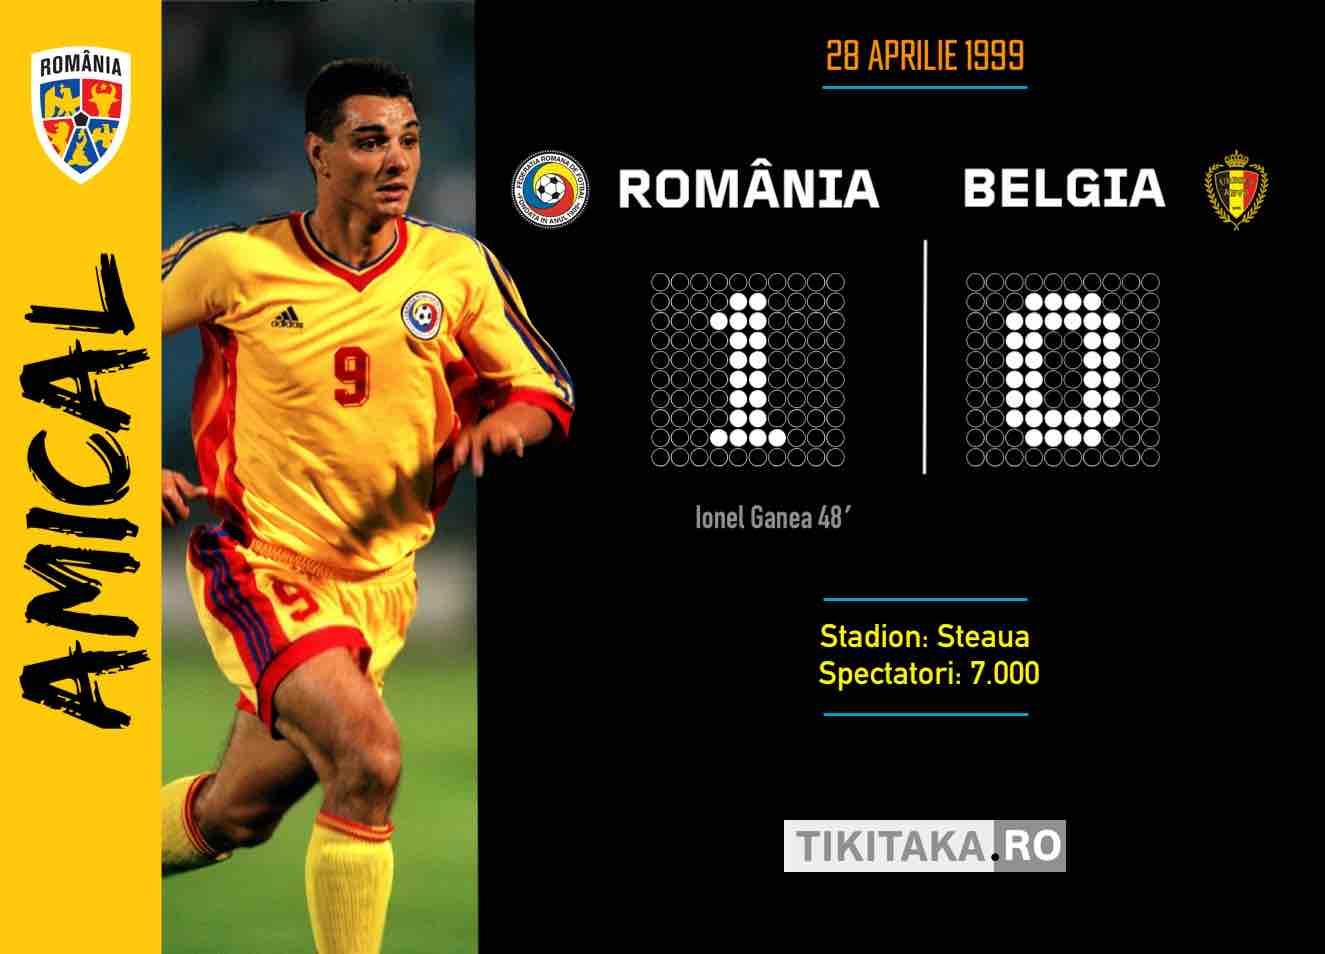 Romania Belgia 1999